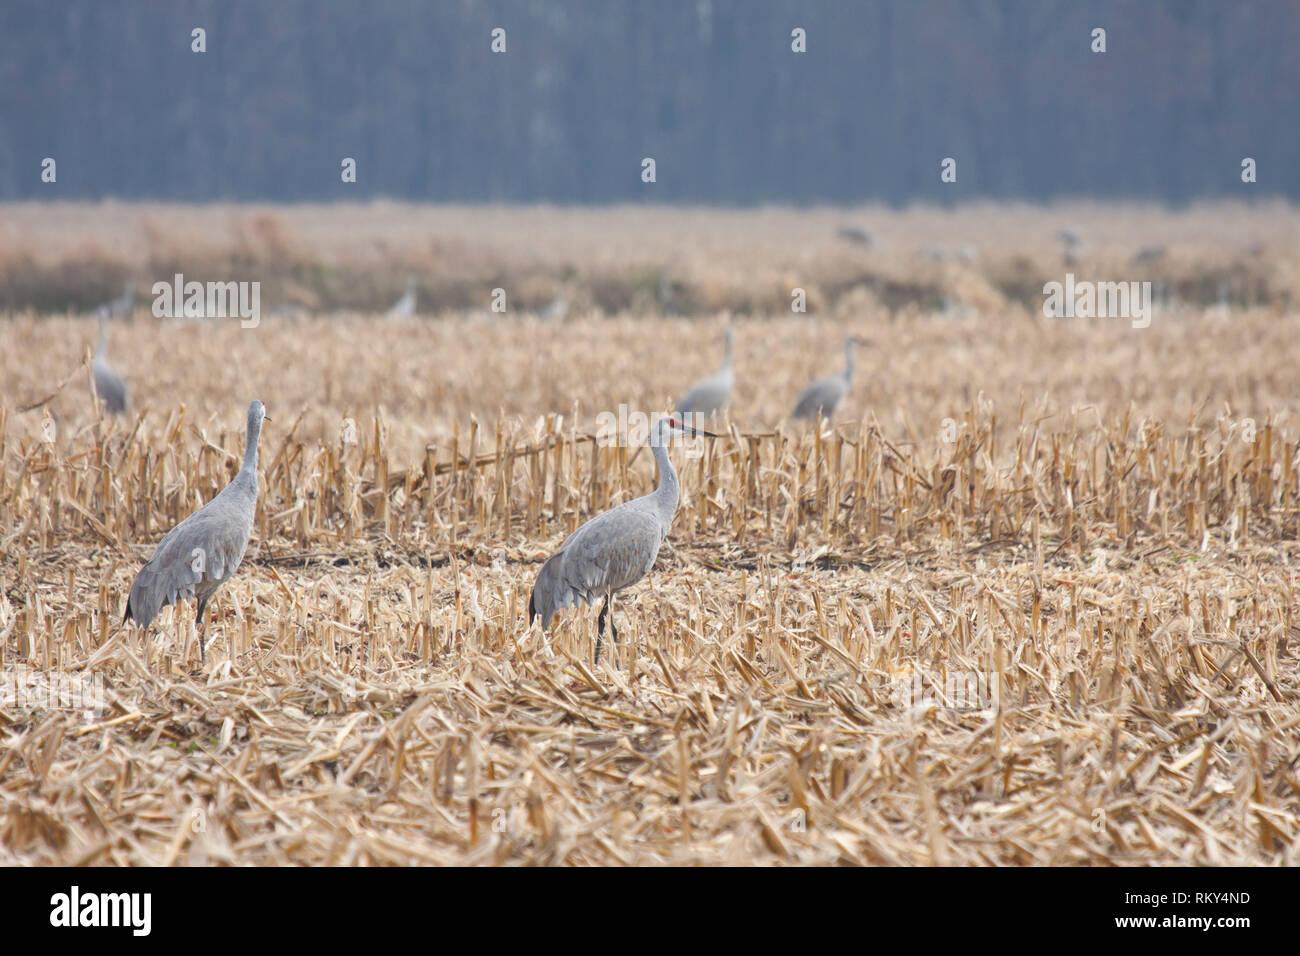 Sandhills walk across in a recently plowed cornfield. - Stock Image